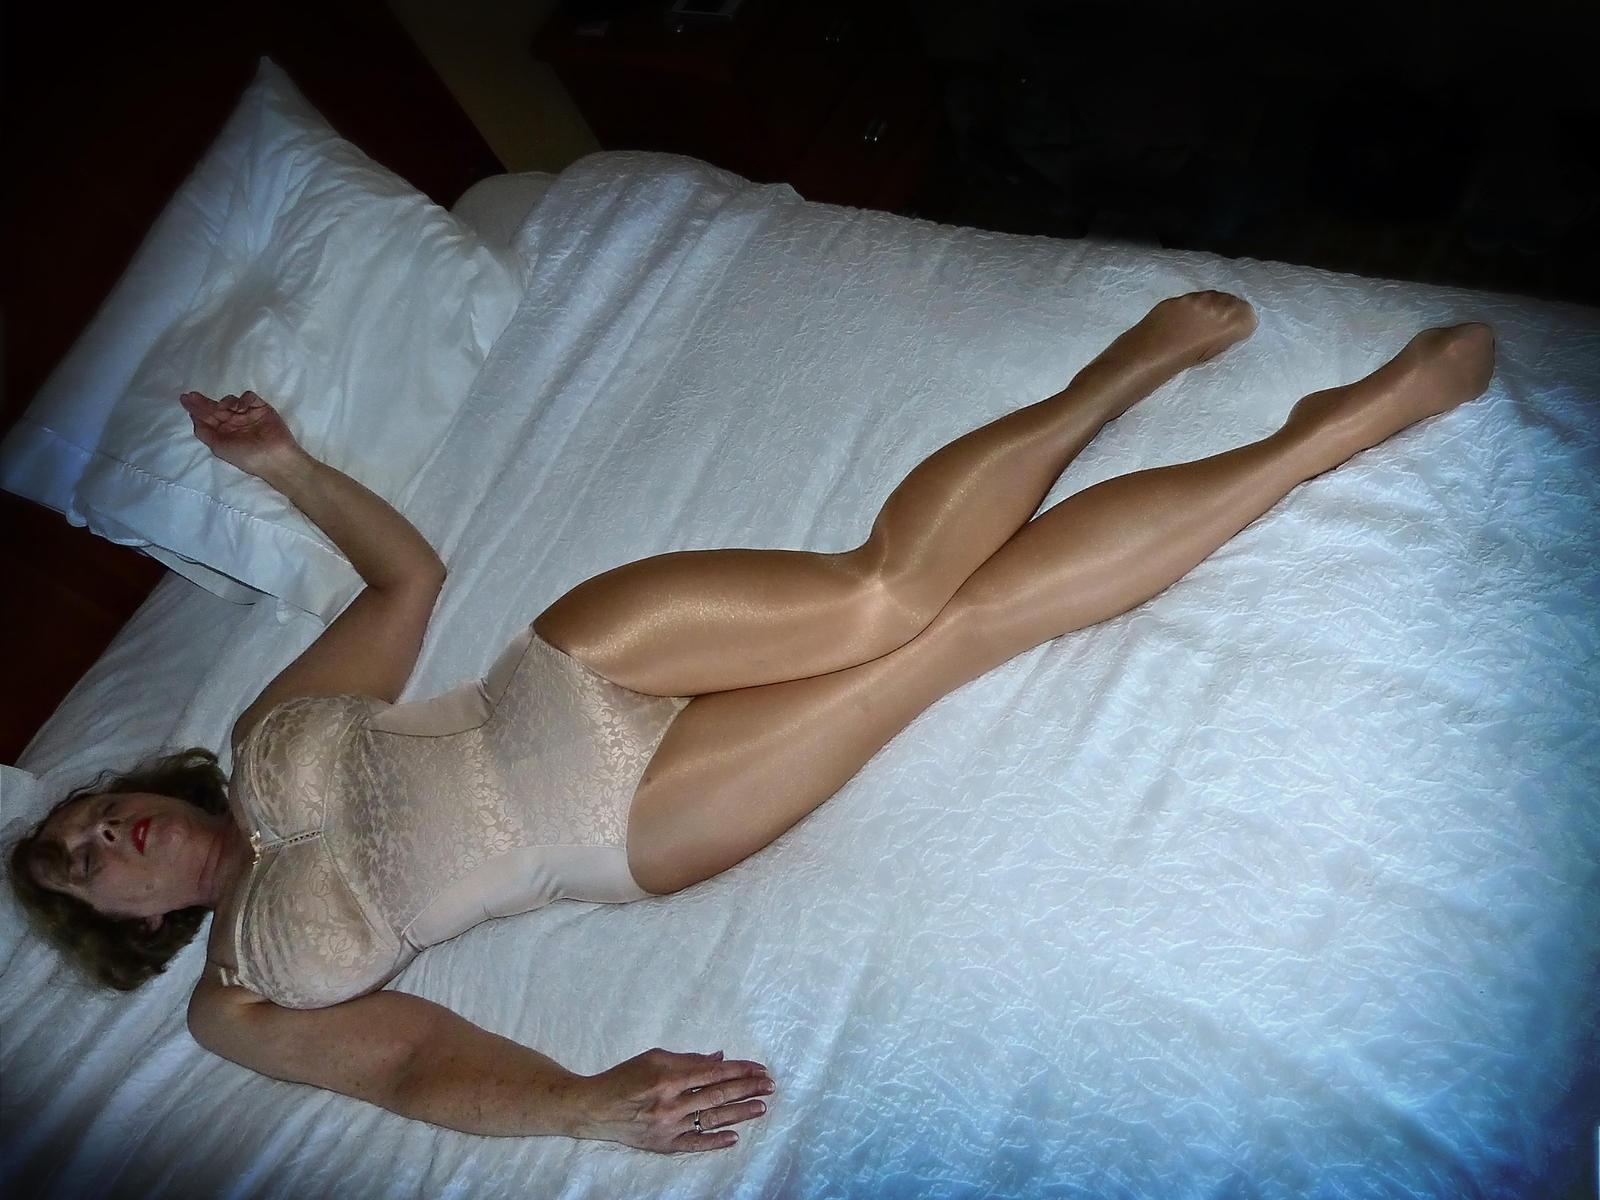 hot women nude sex